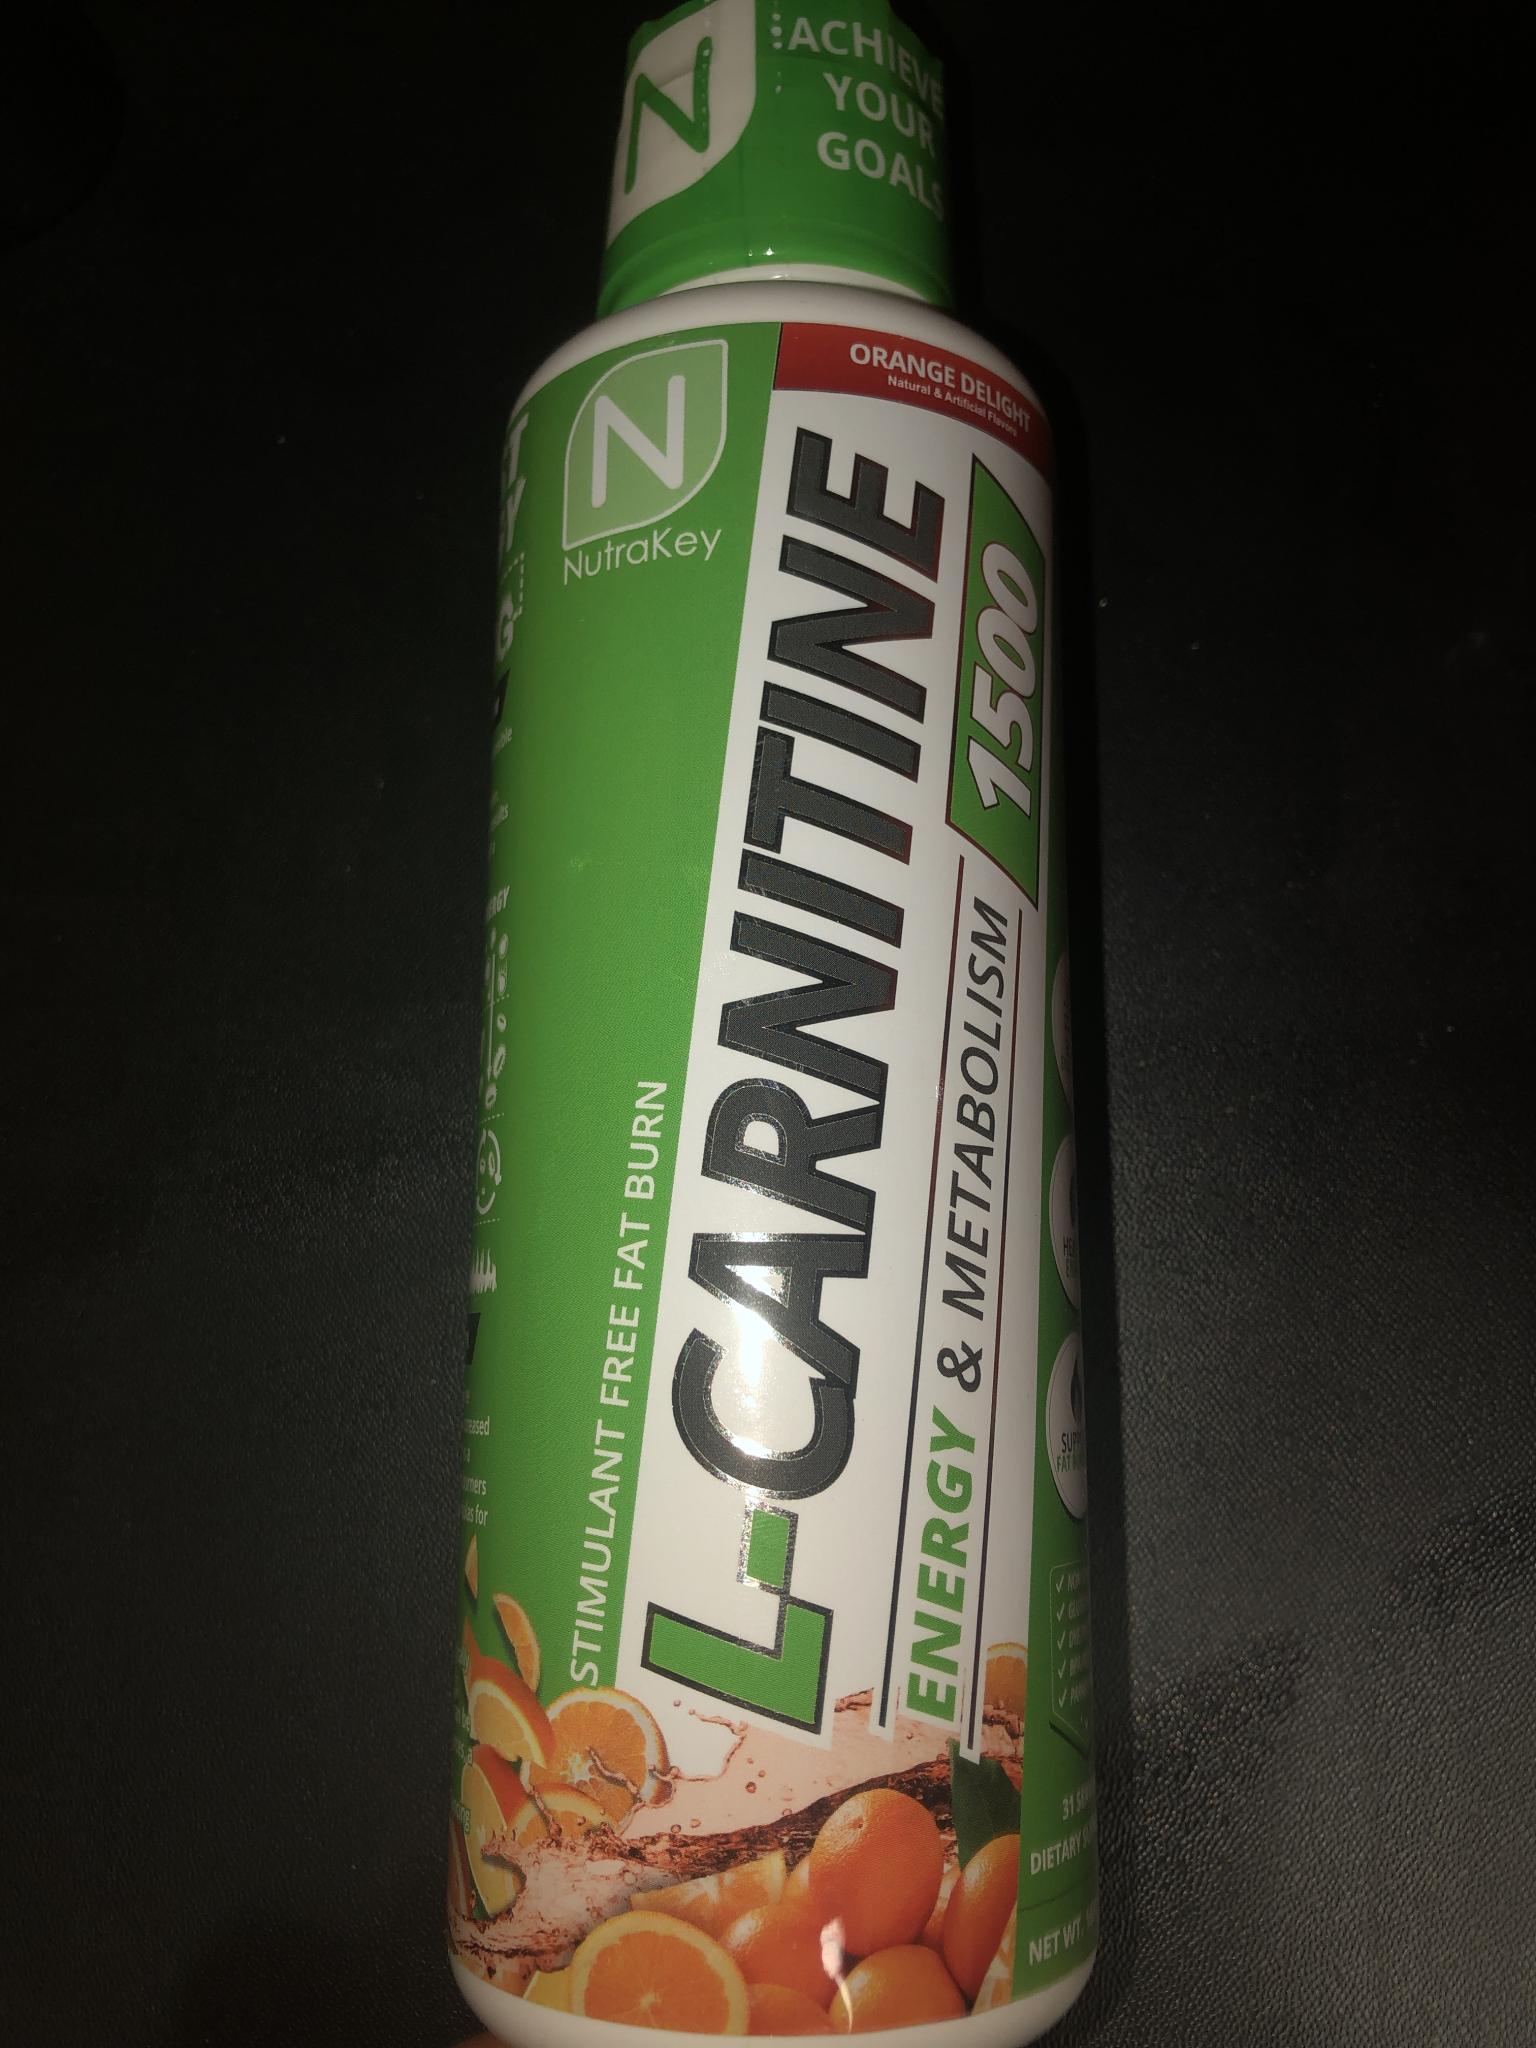 L-Carnitine 1500 Orange Delight KOHYROEW5FUN4Q6R355FGKNI